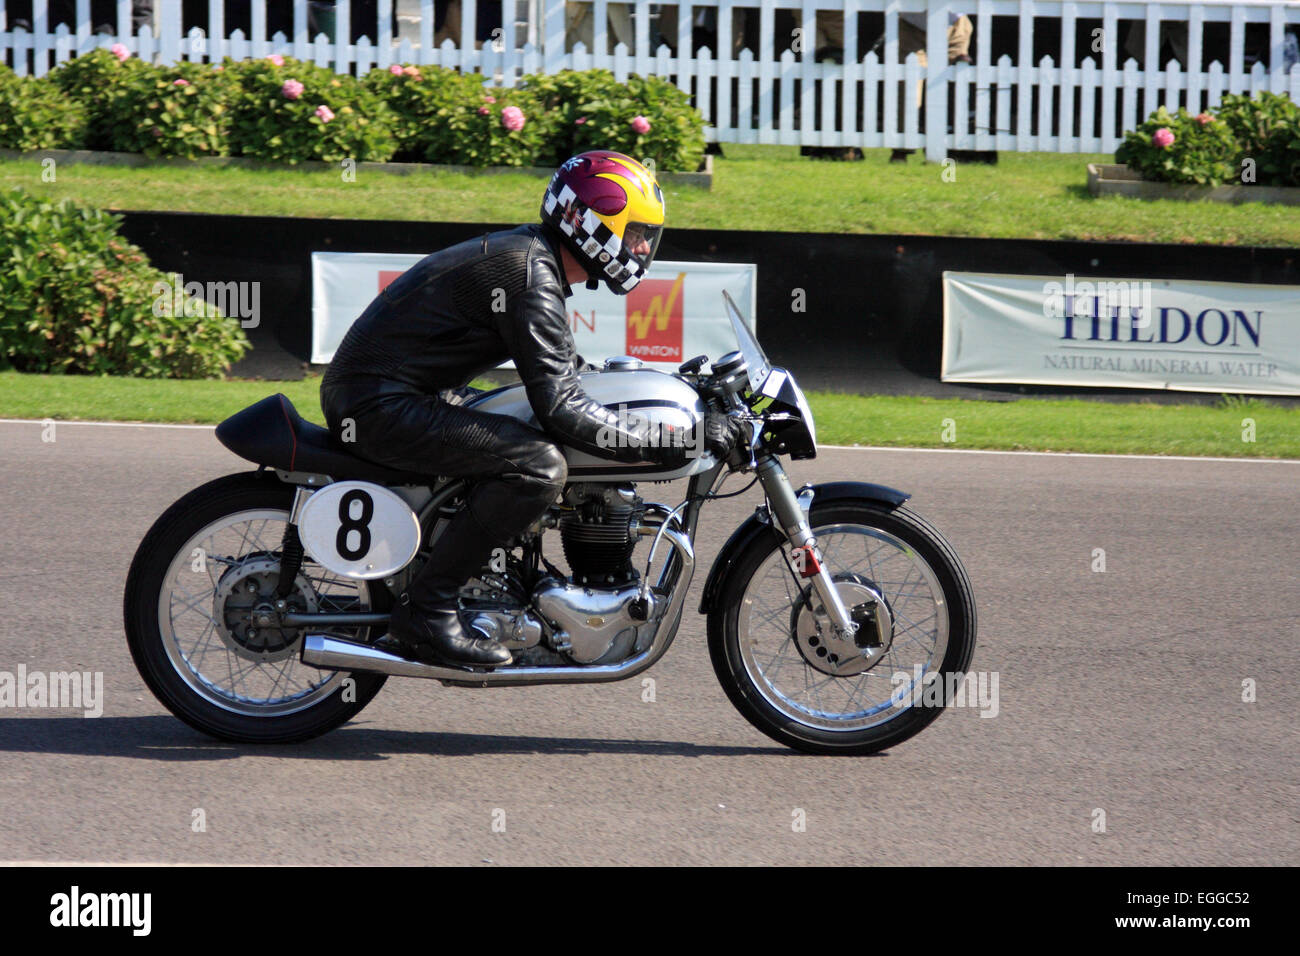 1954 Norton Dominator in Rennen 1 von der Barry Sheene Memorial Trophy / beim Goodwood Revival / Goodwood / Großbritannien Stockbild